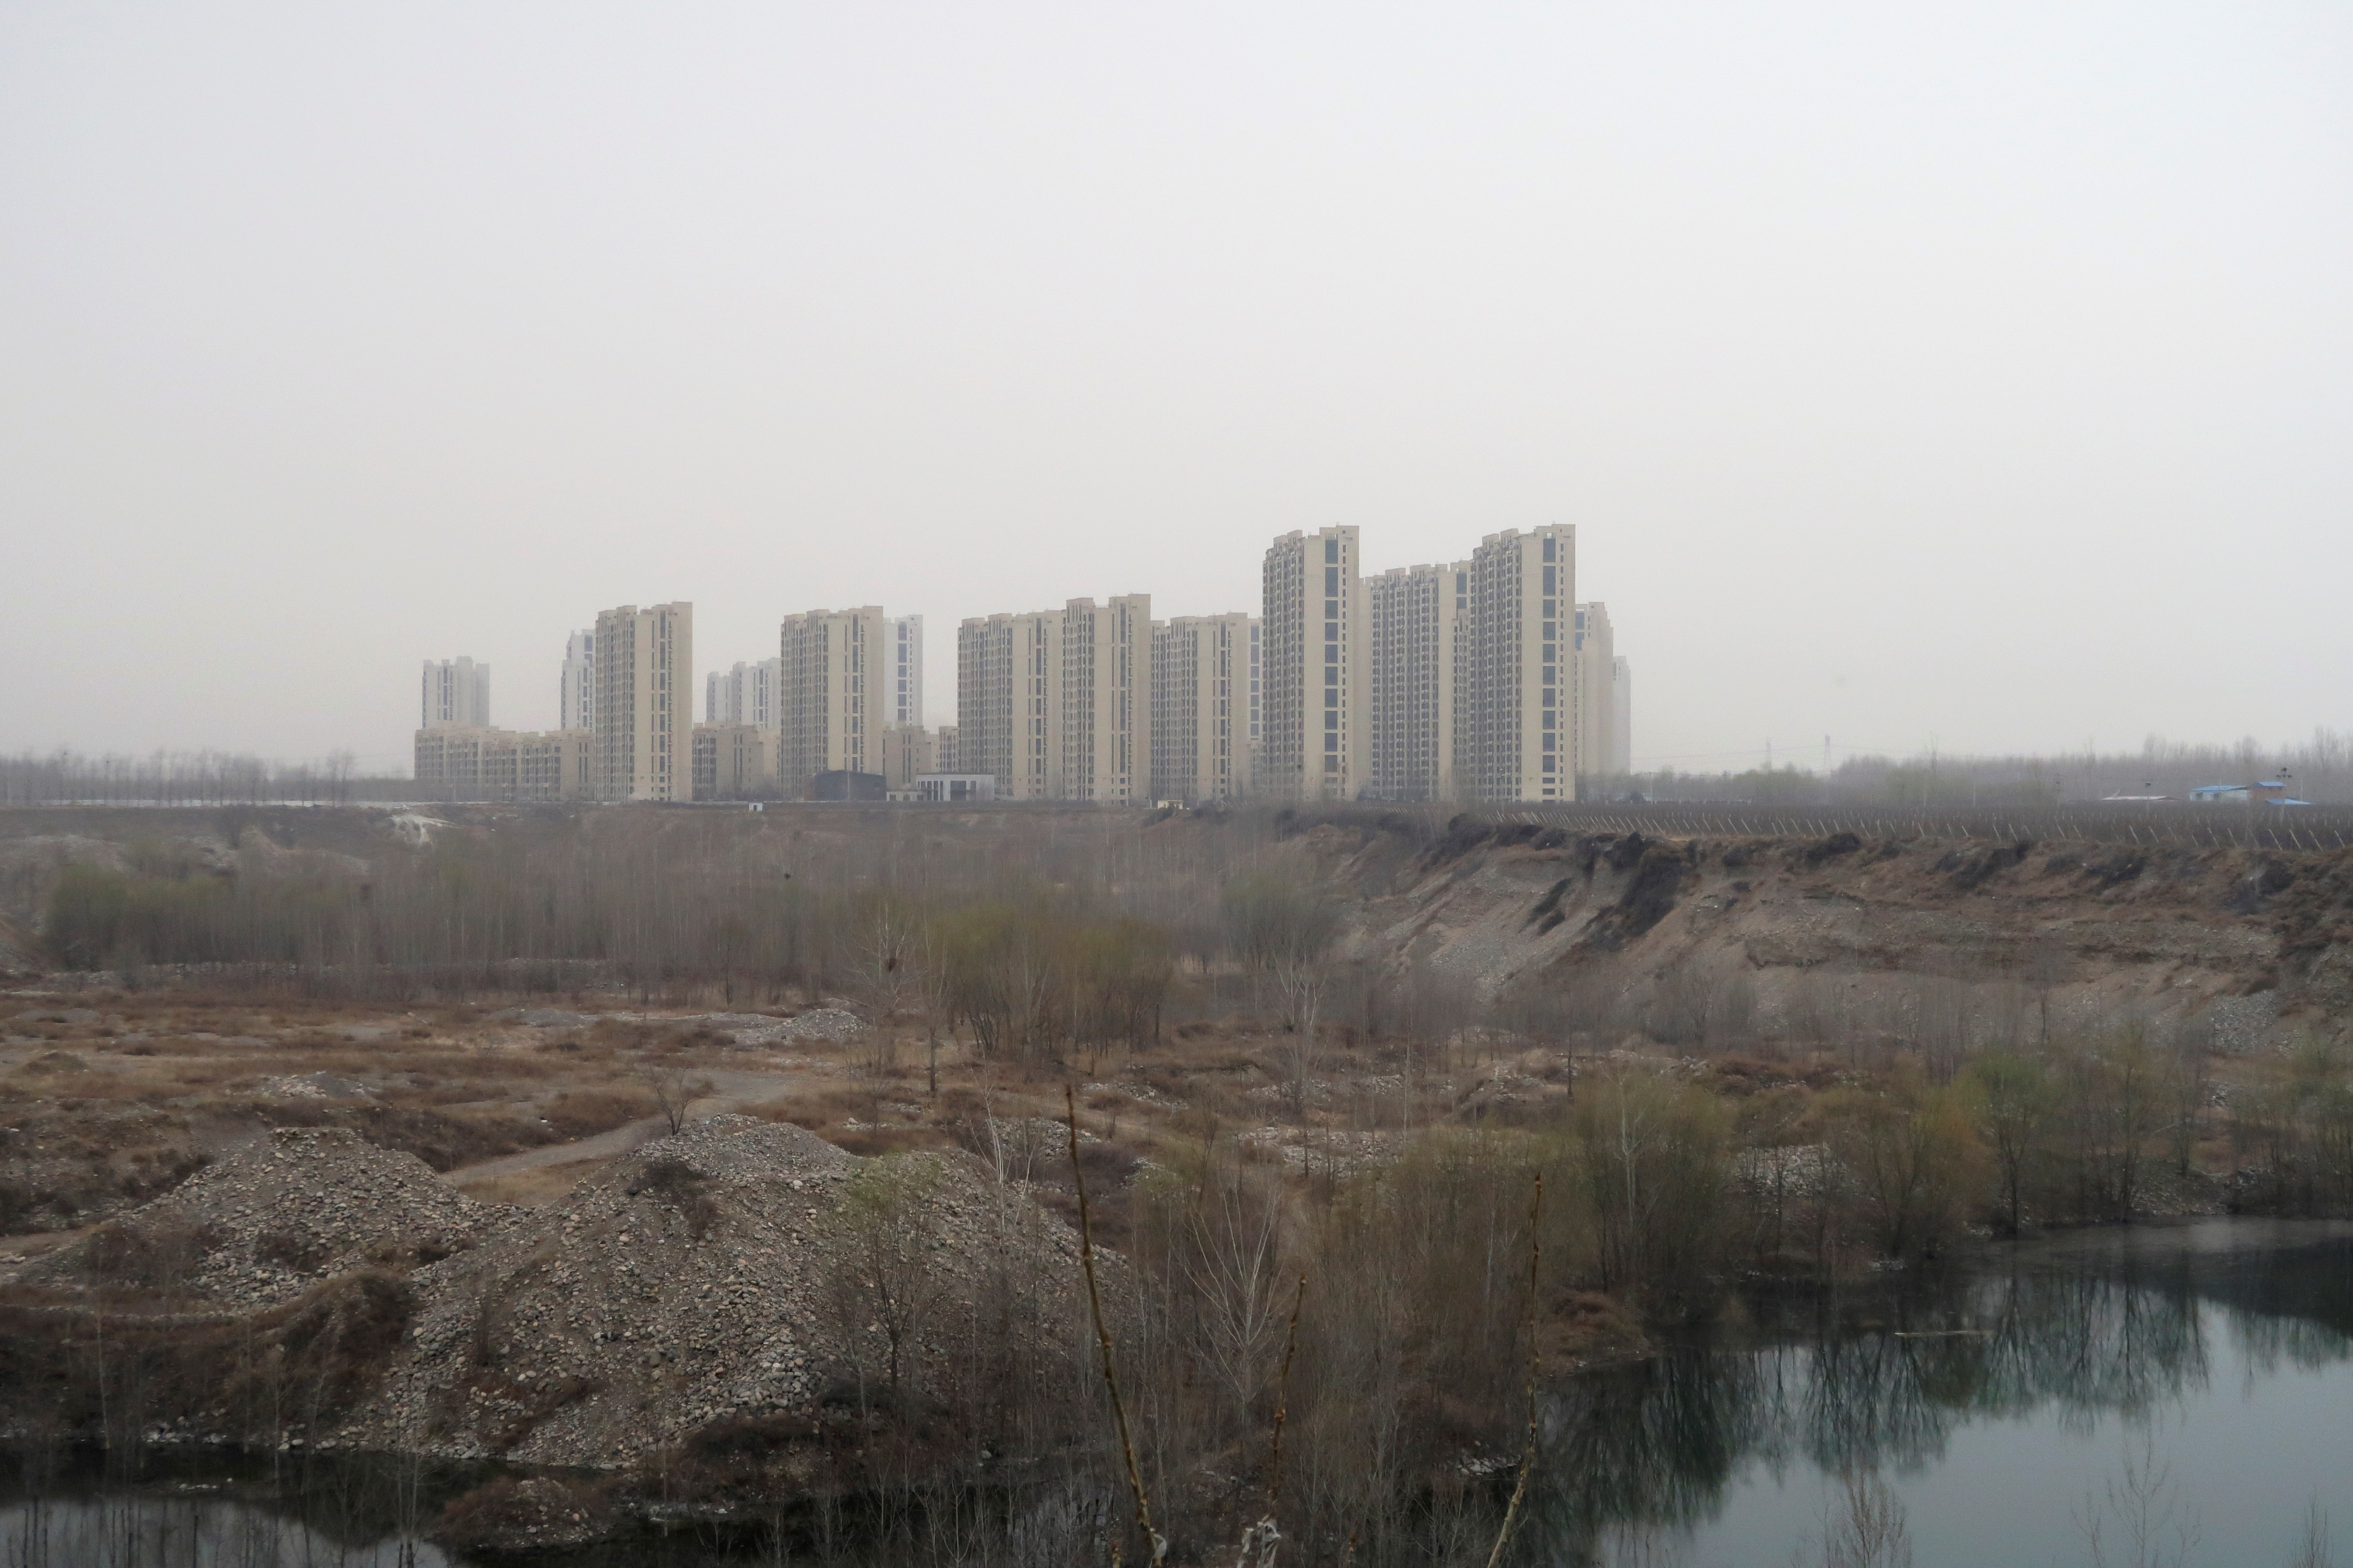 The Taoyuan Xindu Kongquecheng apartment compound developed by China Fortune Land Development is seen in Zhuozhou, Hebei province, China March 19, 2021. Picture taken March 19, 2021. REUTERS/Lusha Zhang